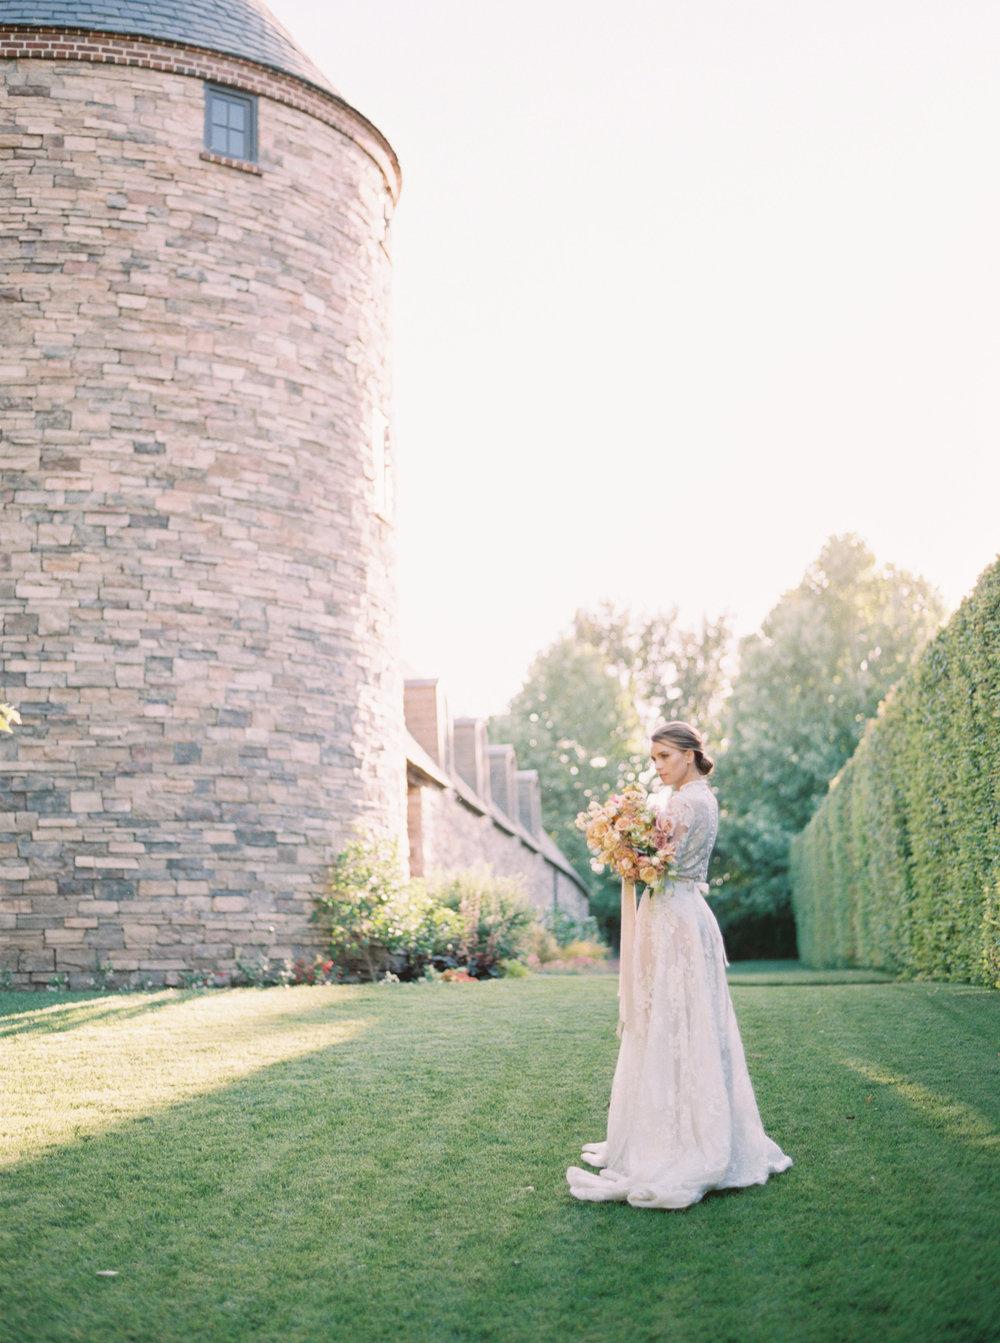 JennyQuicksallPhotography_www.jennyquicksall.com_KestlerPark_SantaYnezCalifornia_JoyProctor(19).jpg